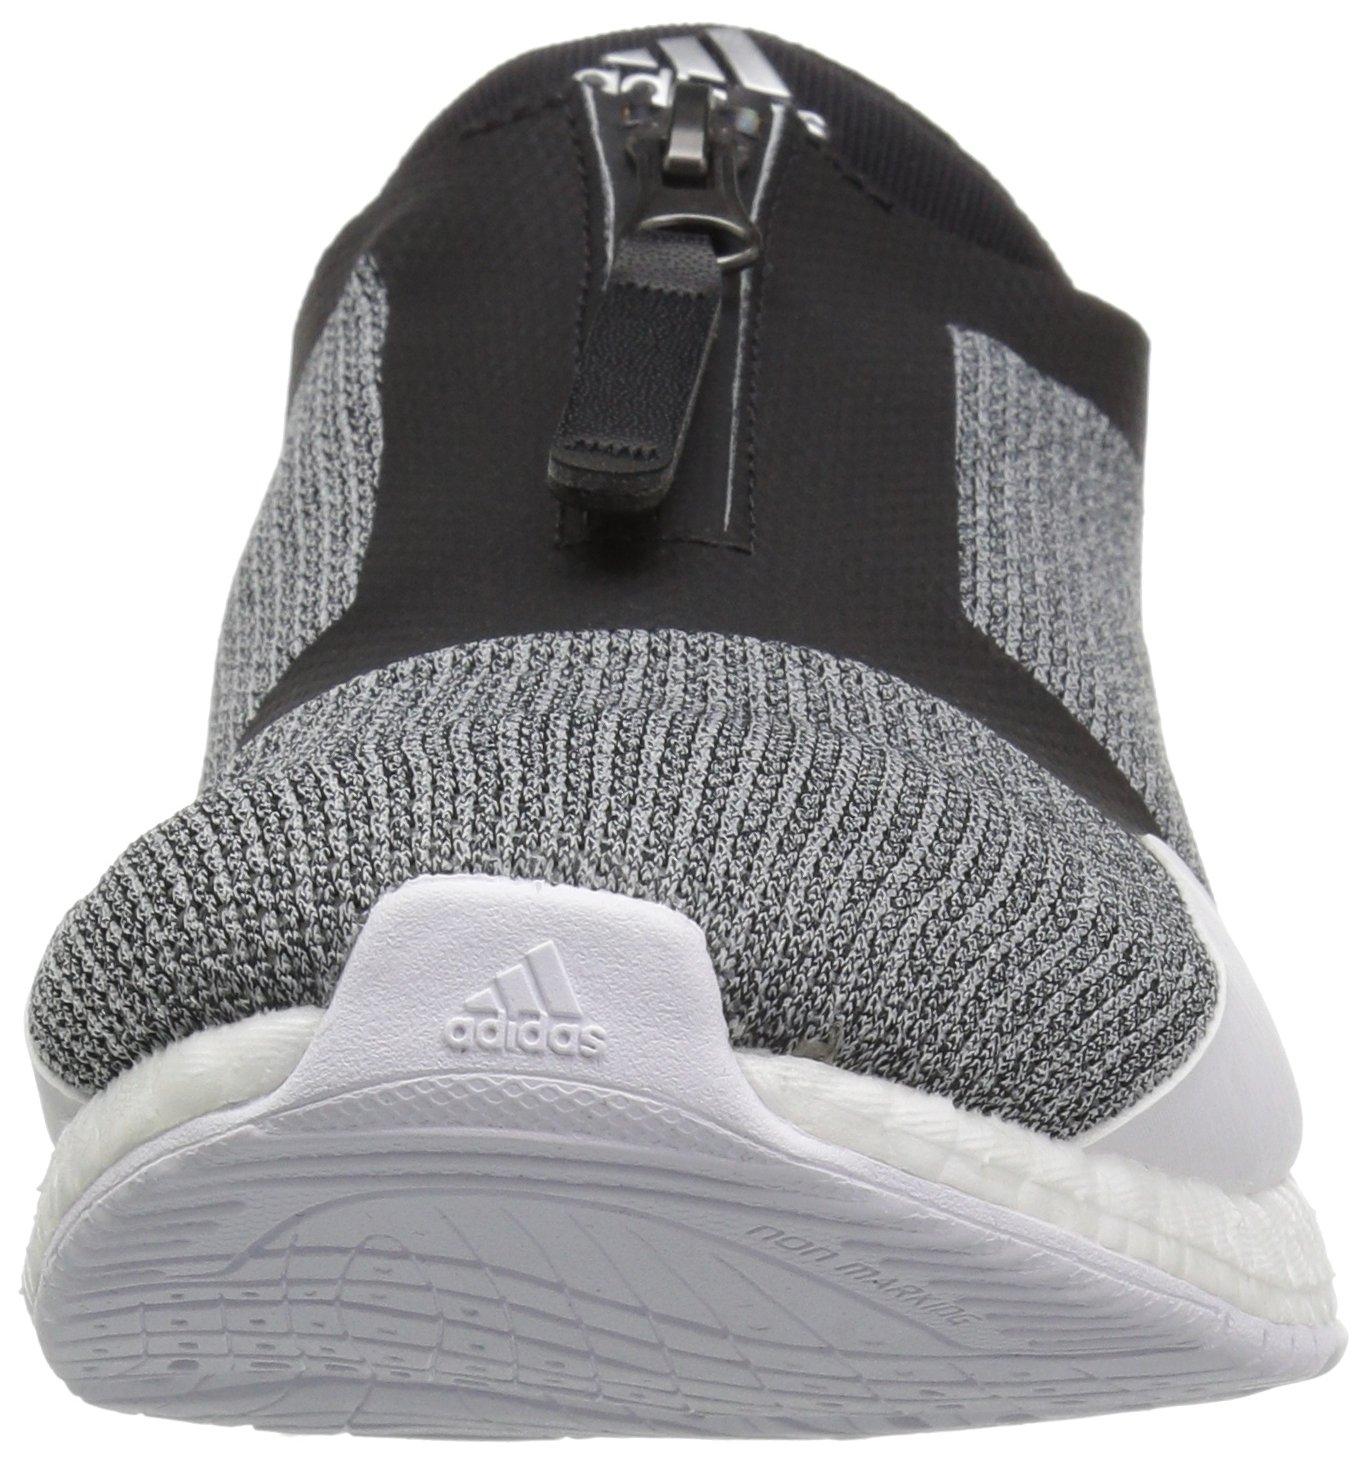 81 KSSYueOL - adidas Womens Pure Boost x tr Zip Low Top Slip On Fashion Sneakers